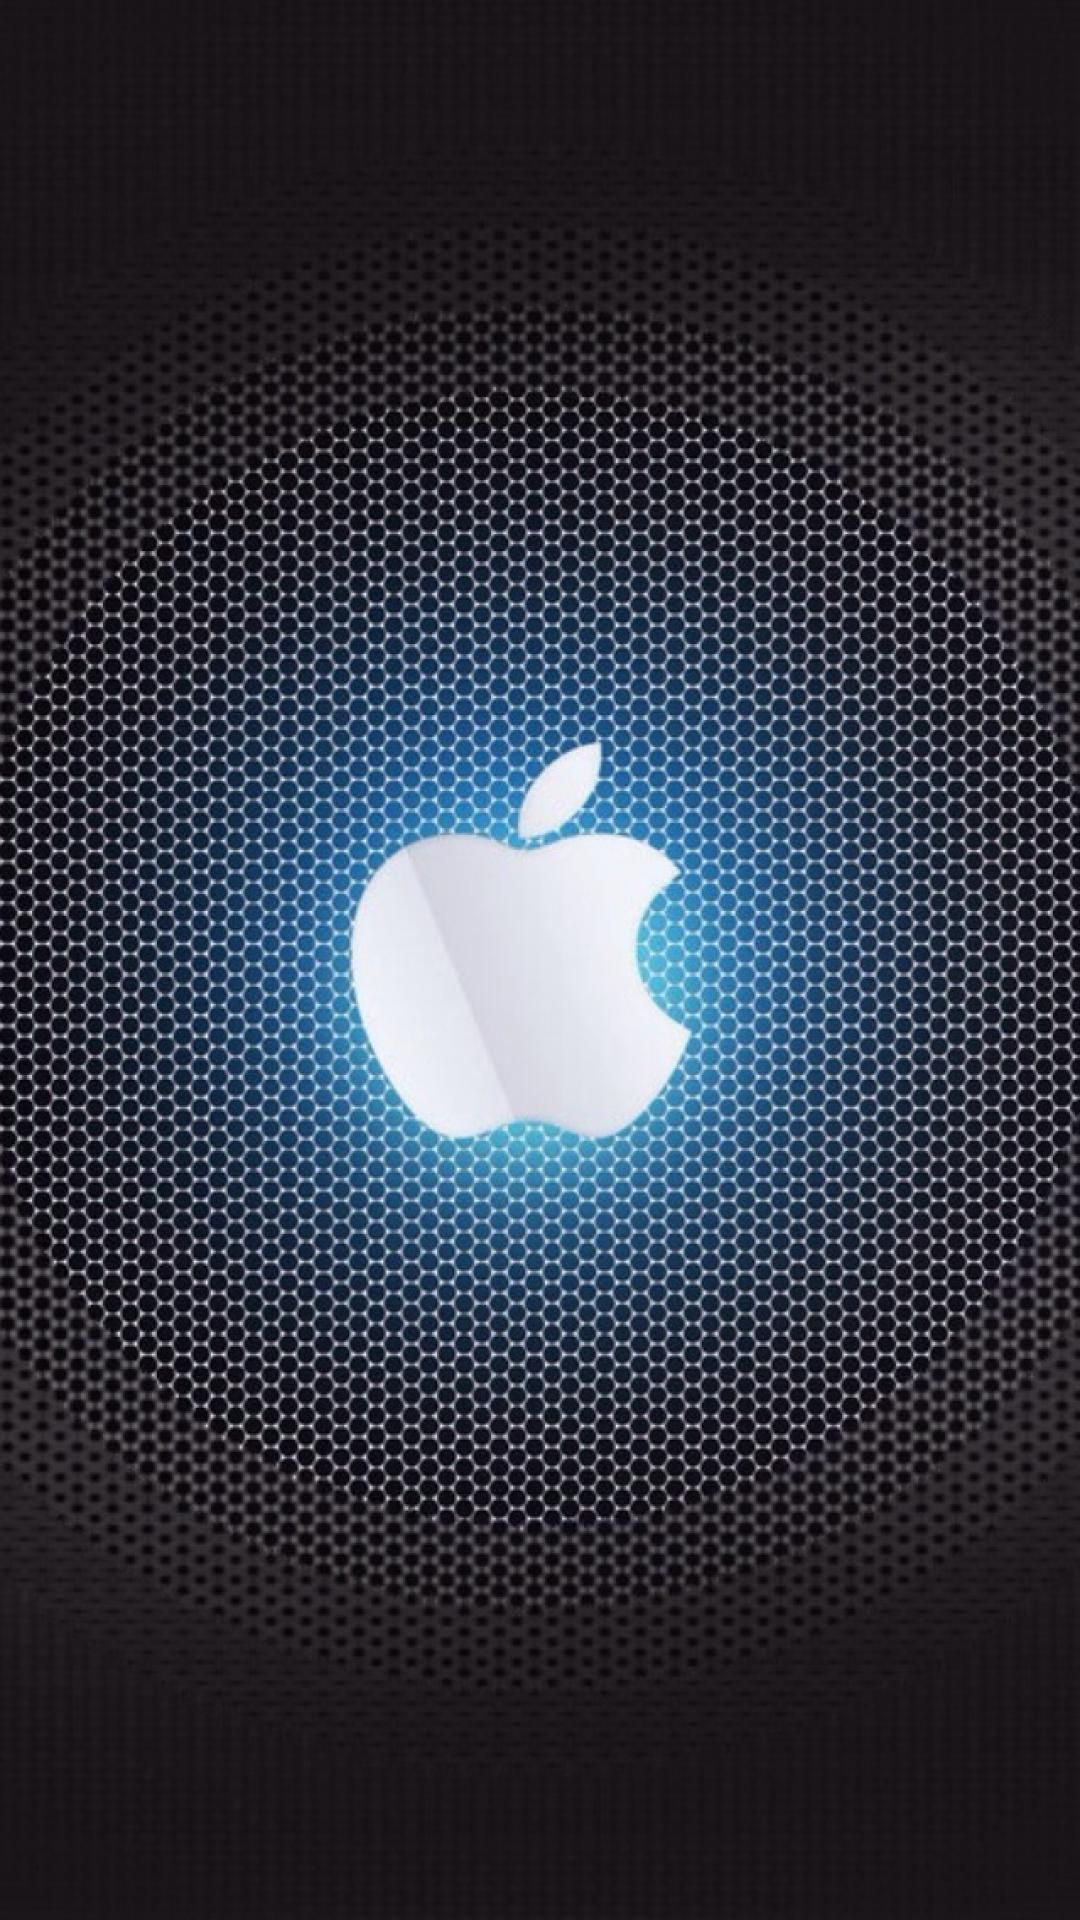 Plus Red Wallpaper Apple Iphone 6 Bing Images Apple